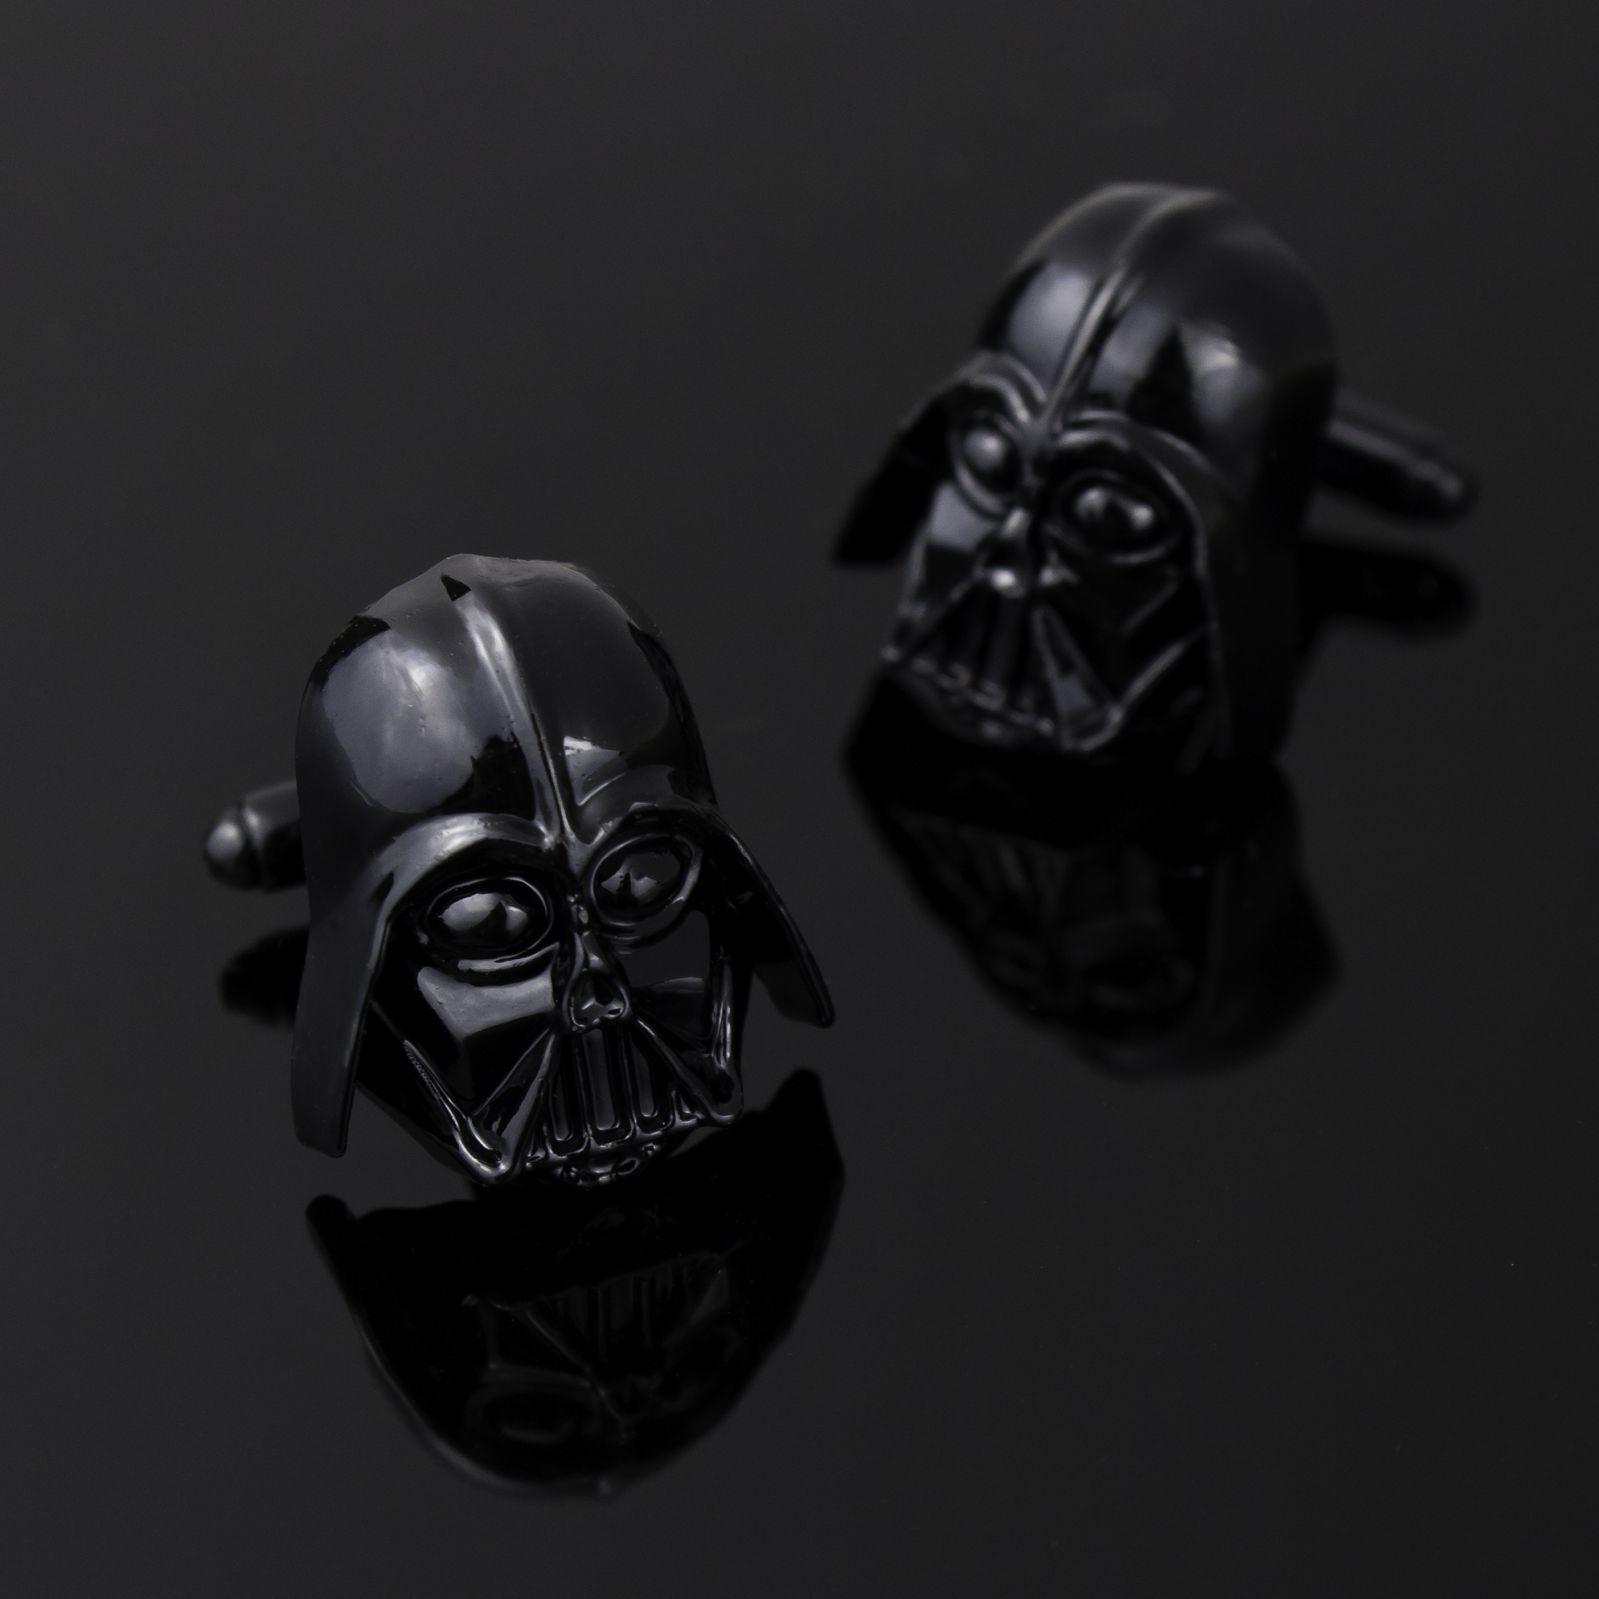 Wedding Cufflinks Darth Vader